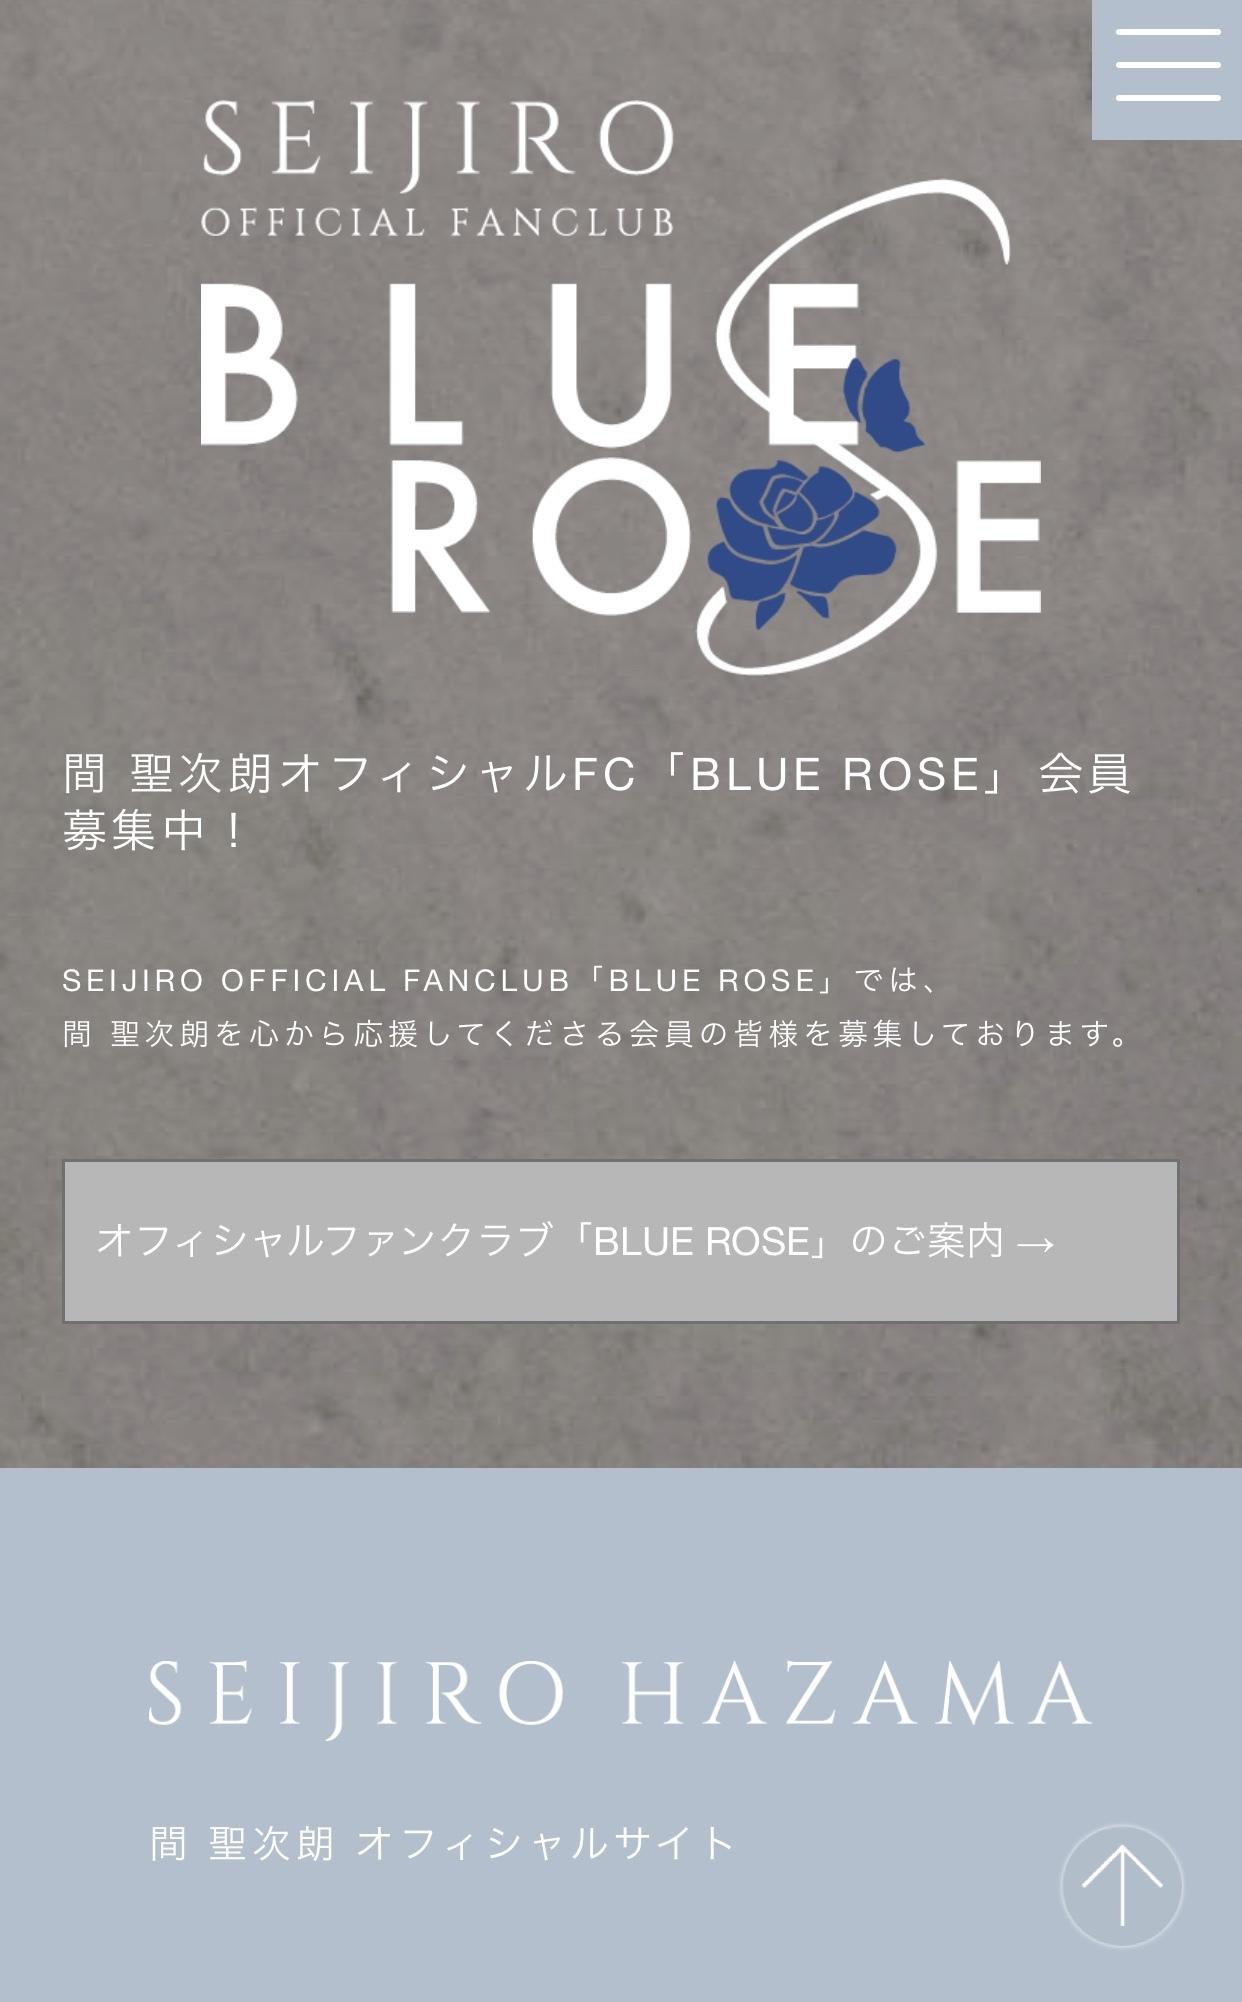 Seijiroオフィシャルファンクラブ「BLUE ROSE」設立記念 オープニングキャンペーン実施中です♡_a0157409_06514739.jpeg